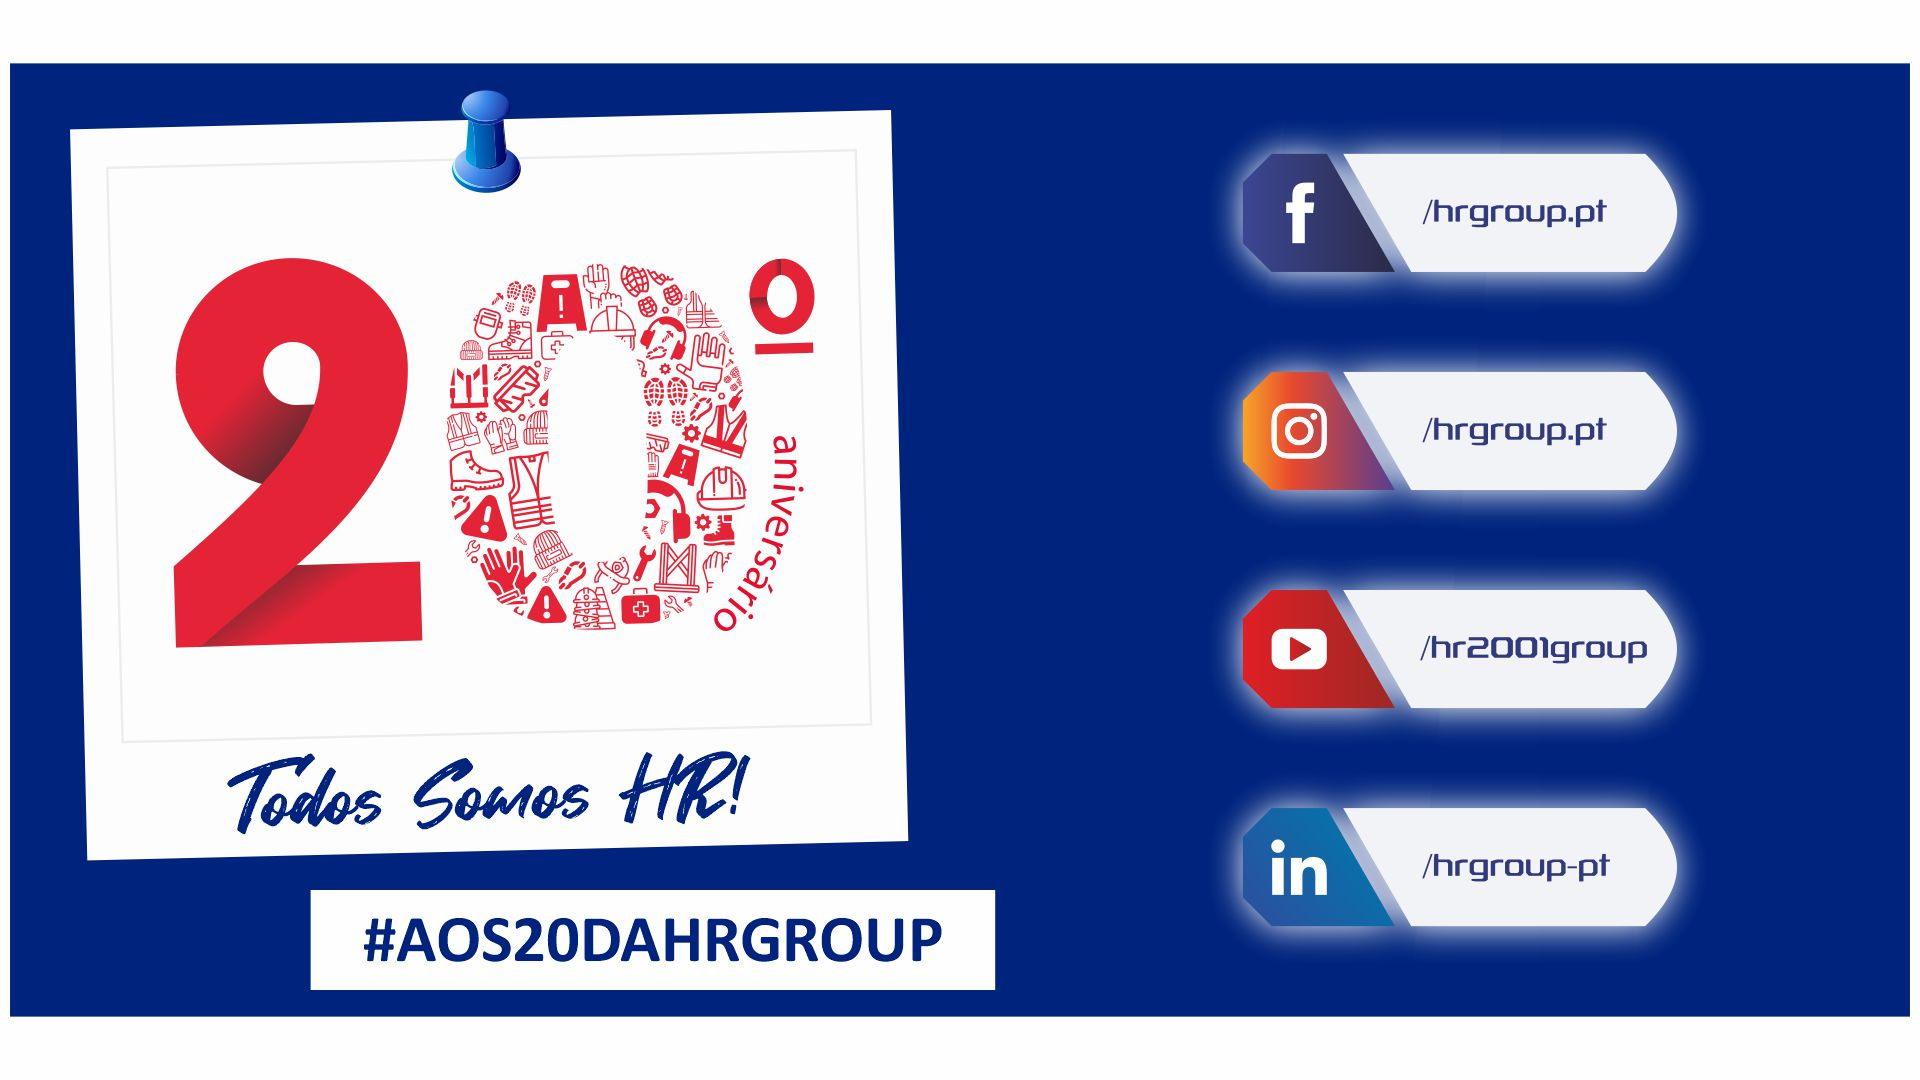 Feliz Aniversário HR Group